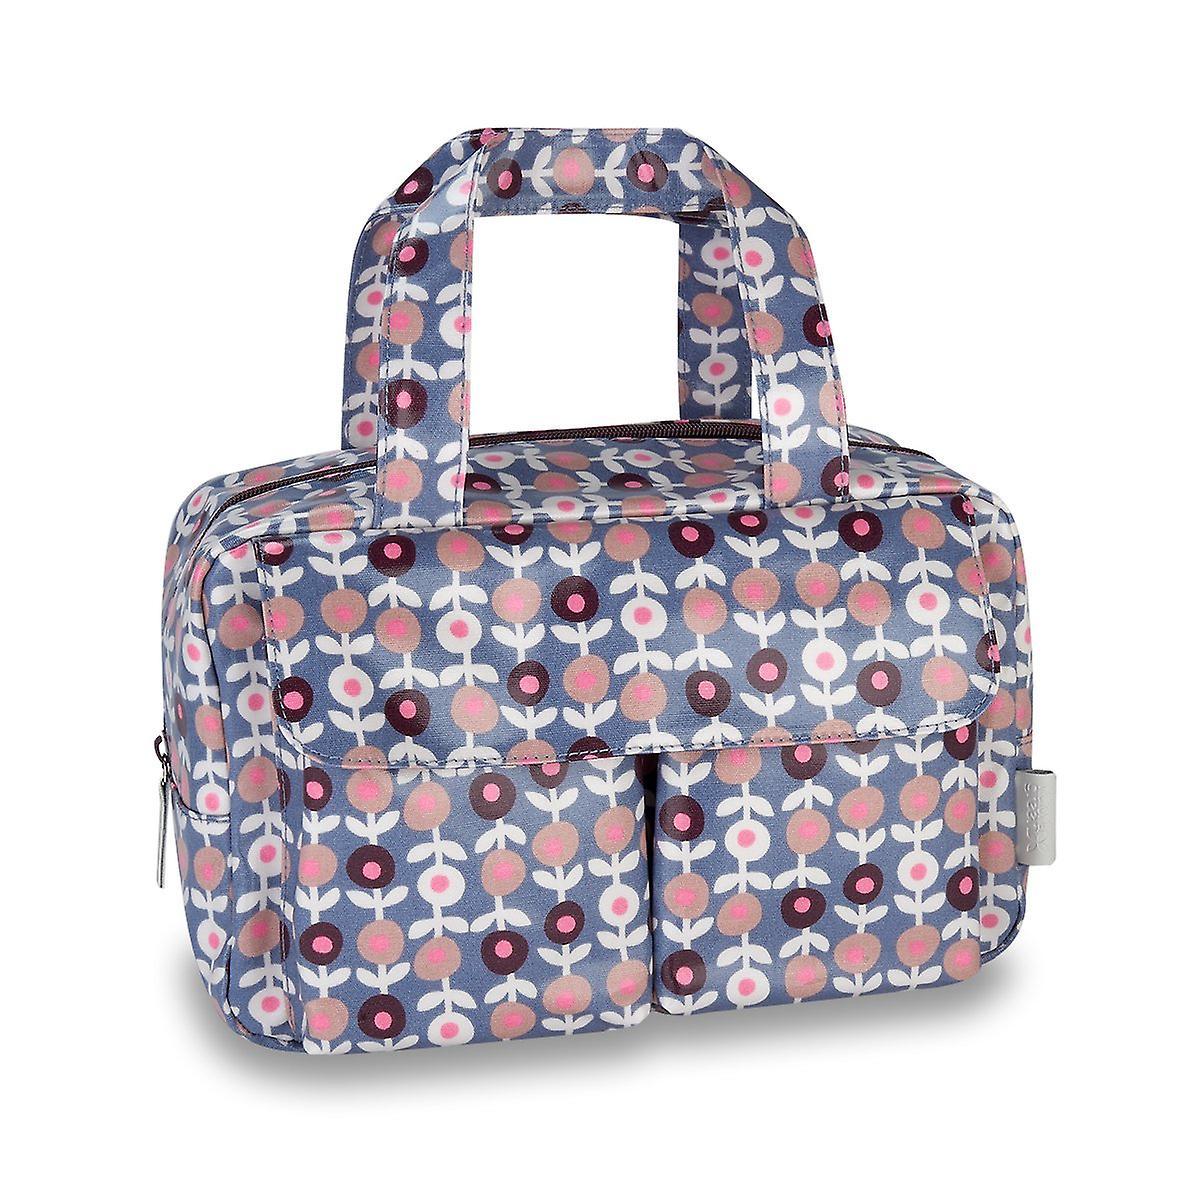 'lorton' carry all wash bag - smoke